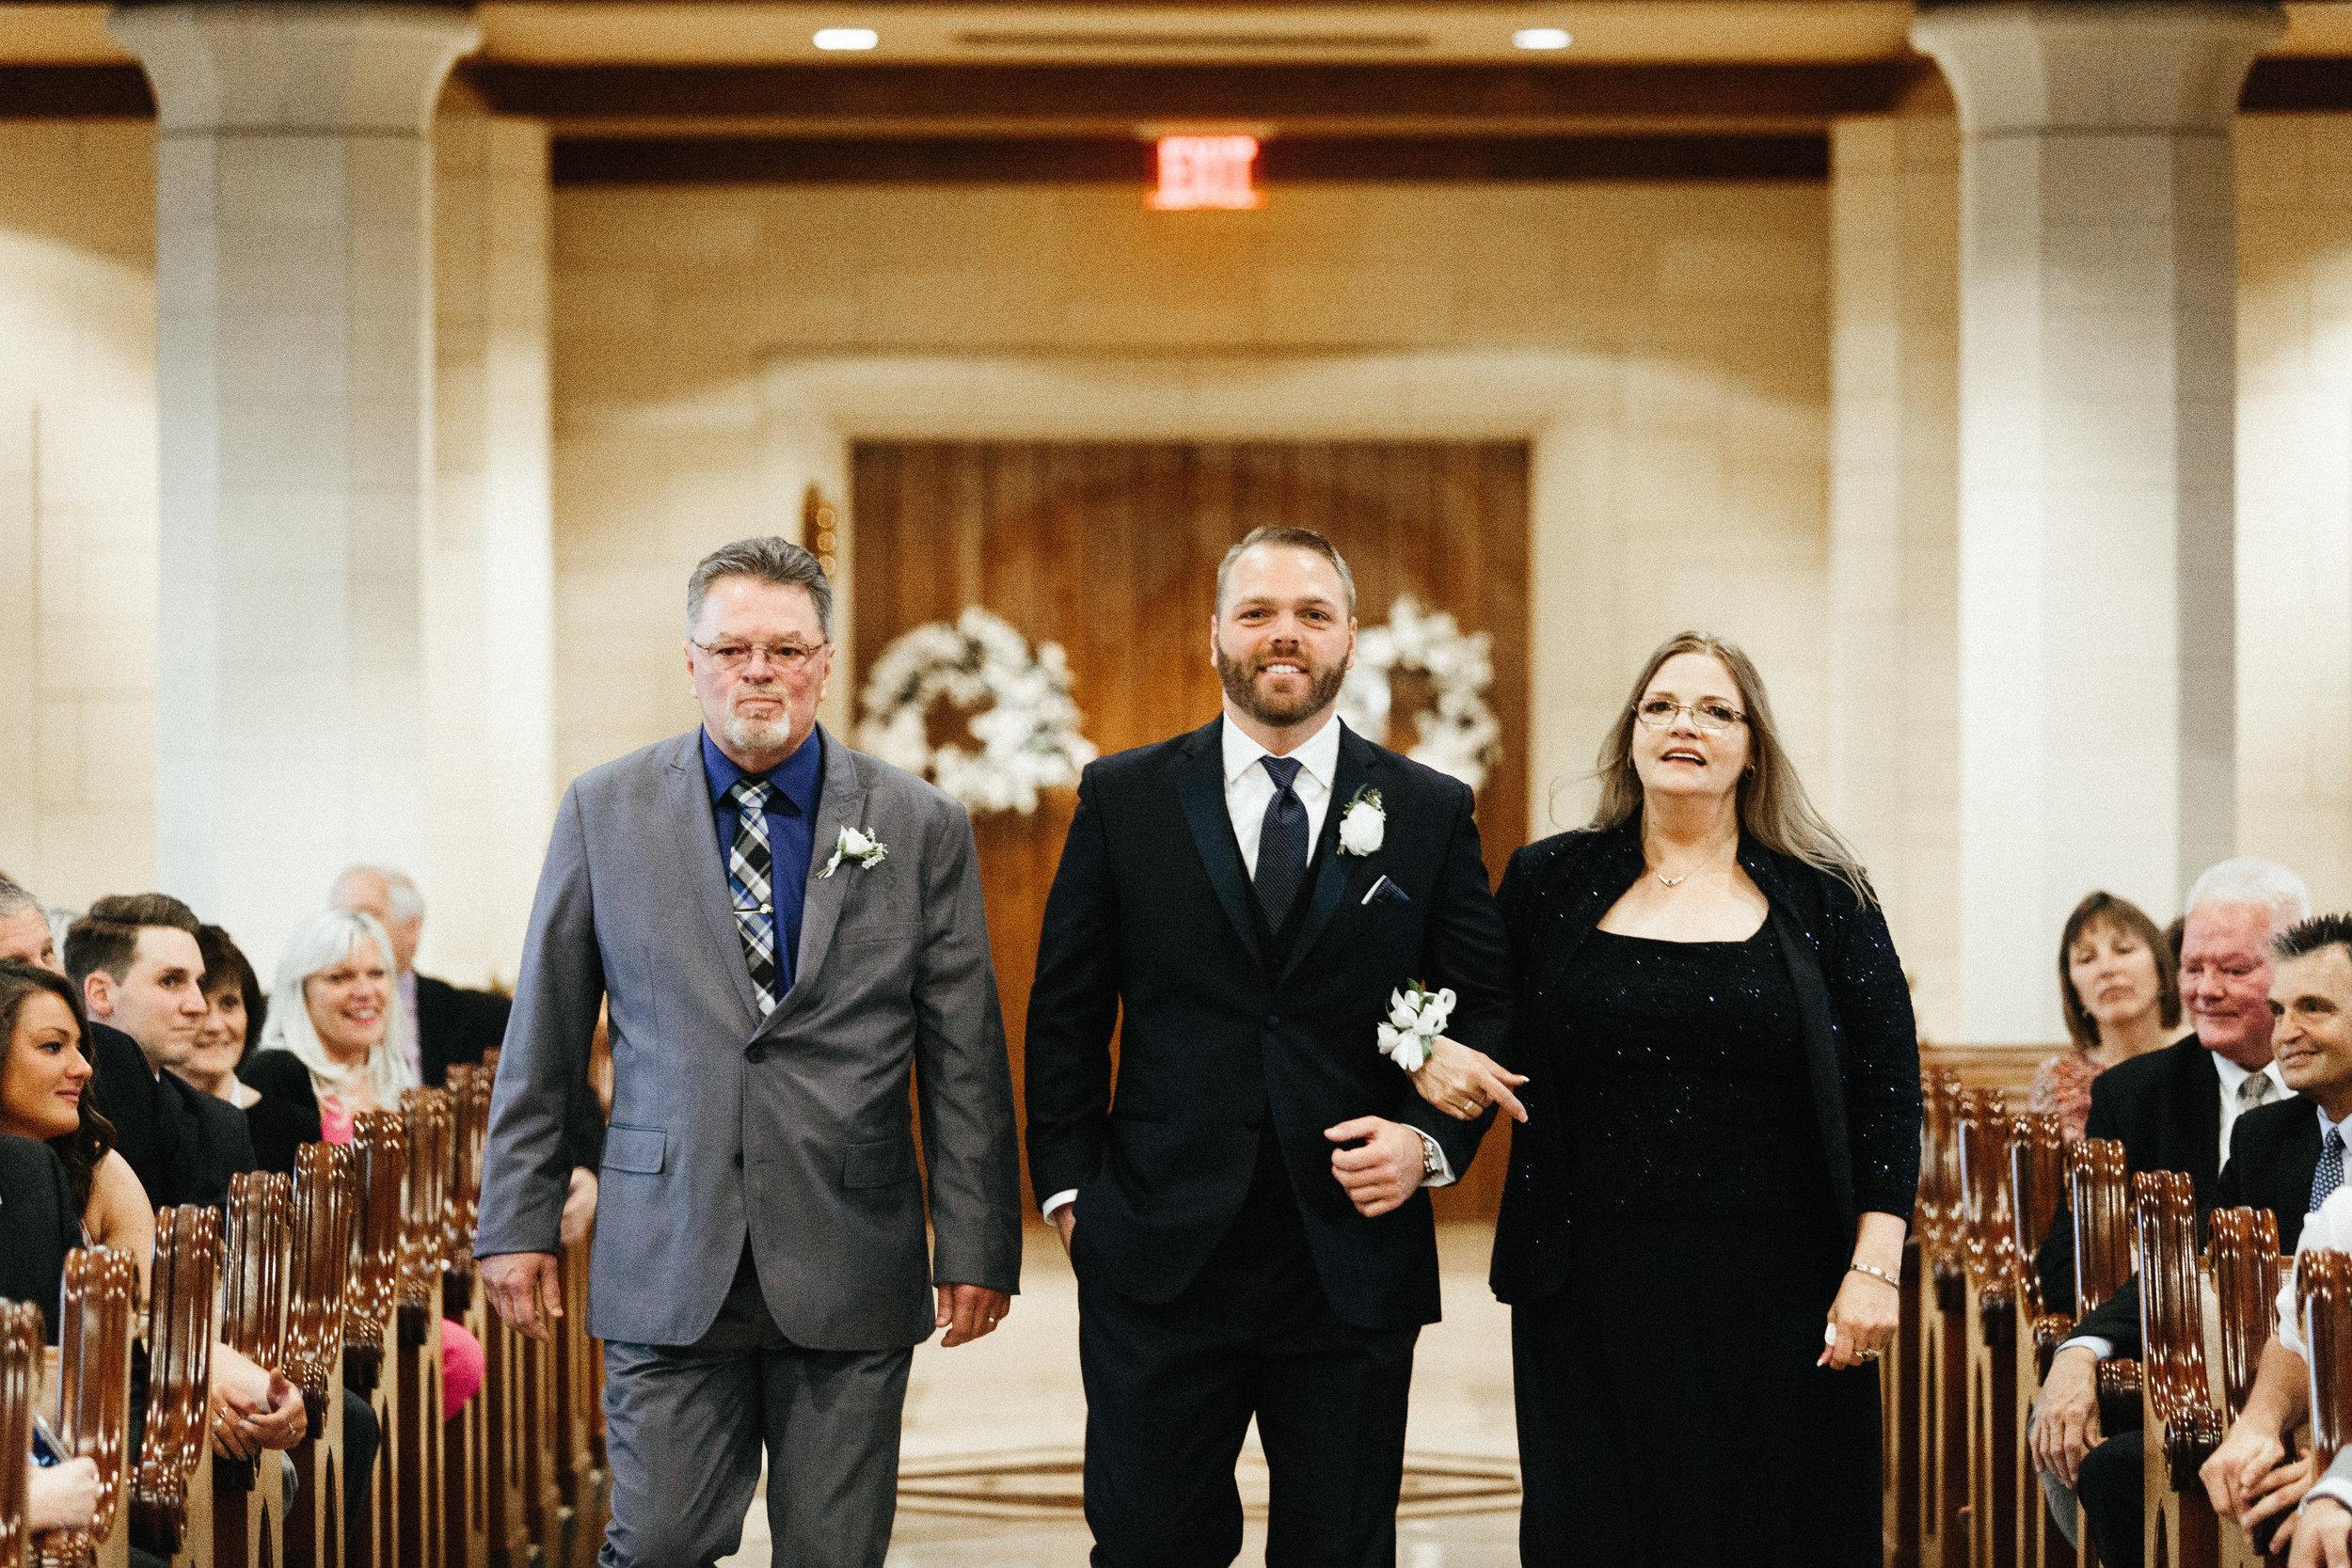 roswell_st_peter_chanel_catholic_avalon_hotel_alpharetta_wedding-1419.jpg